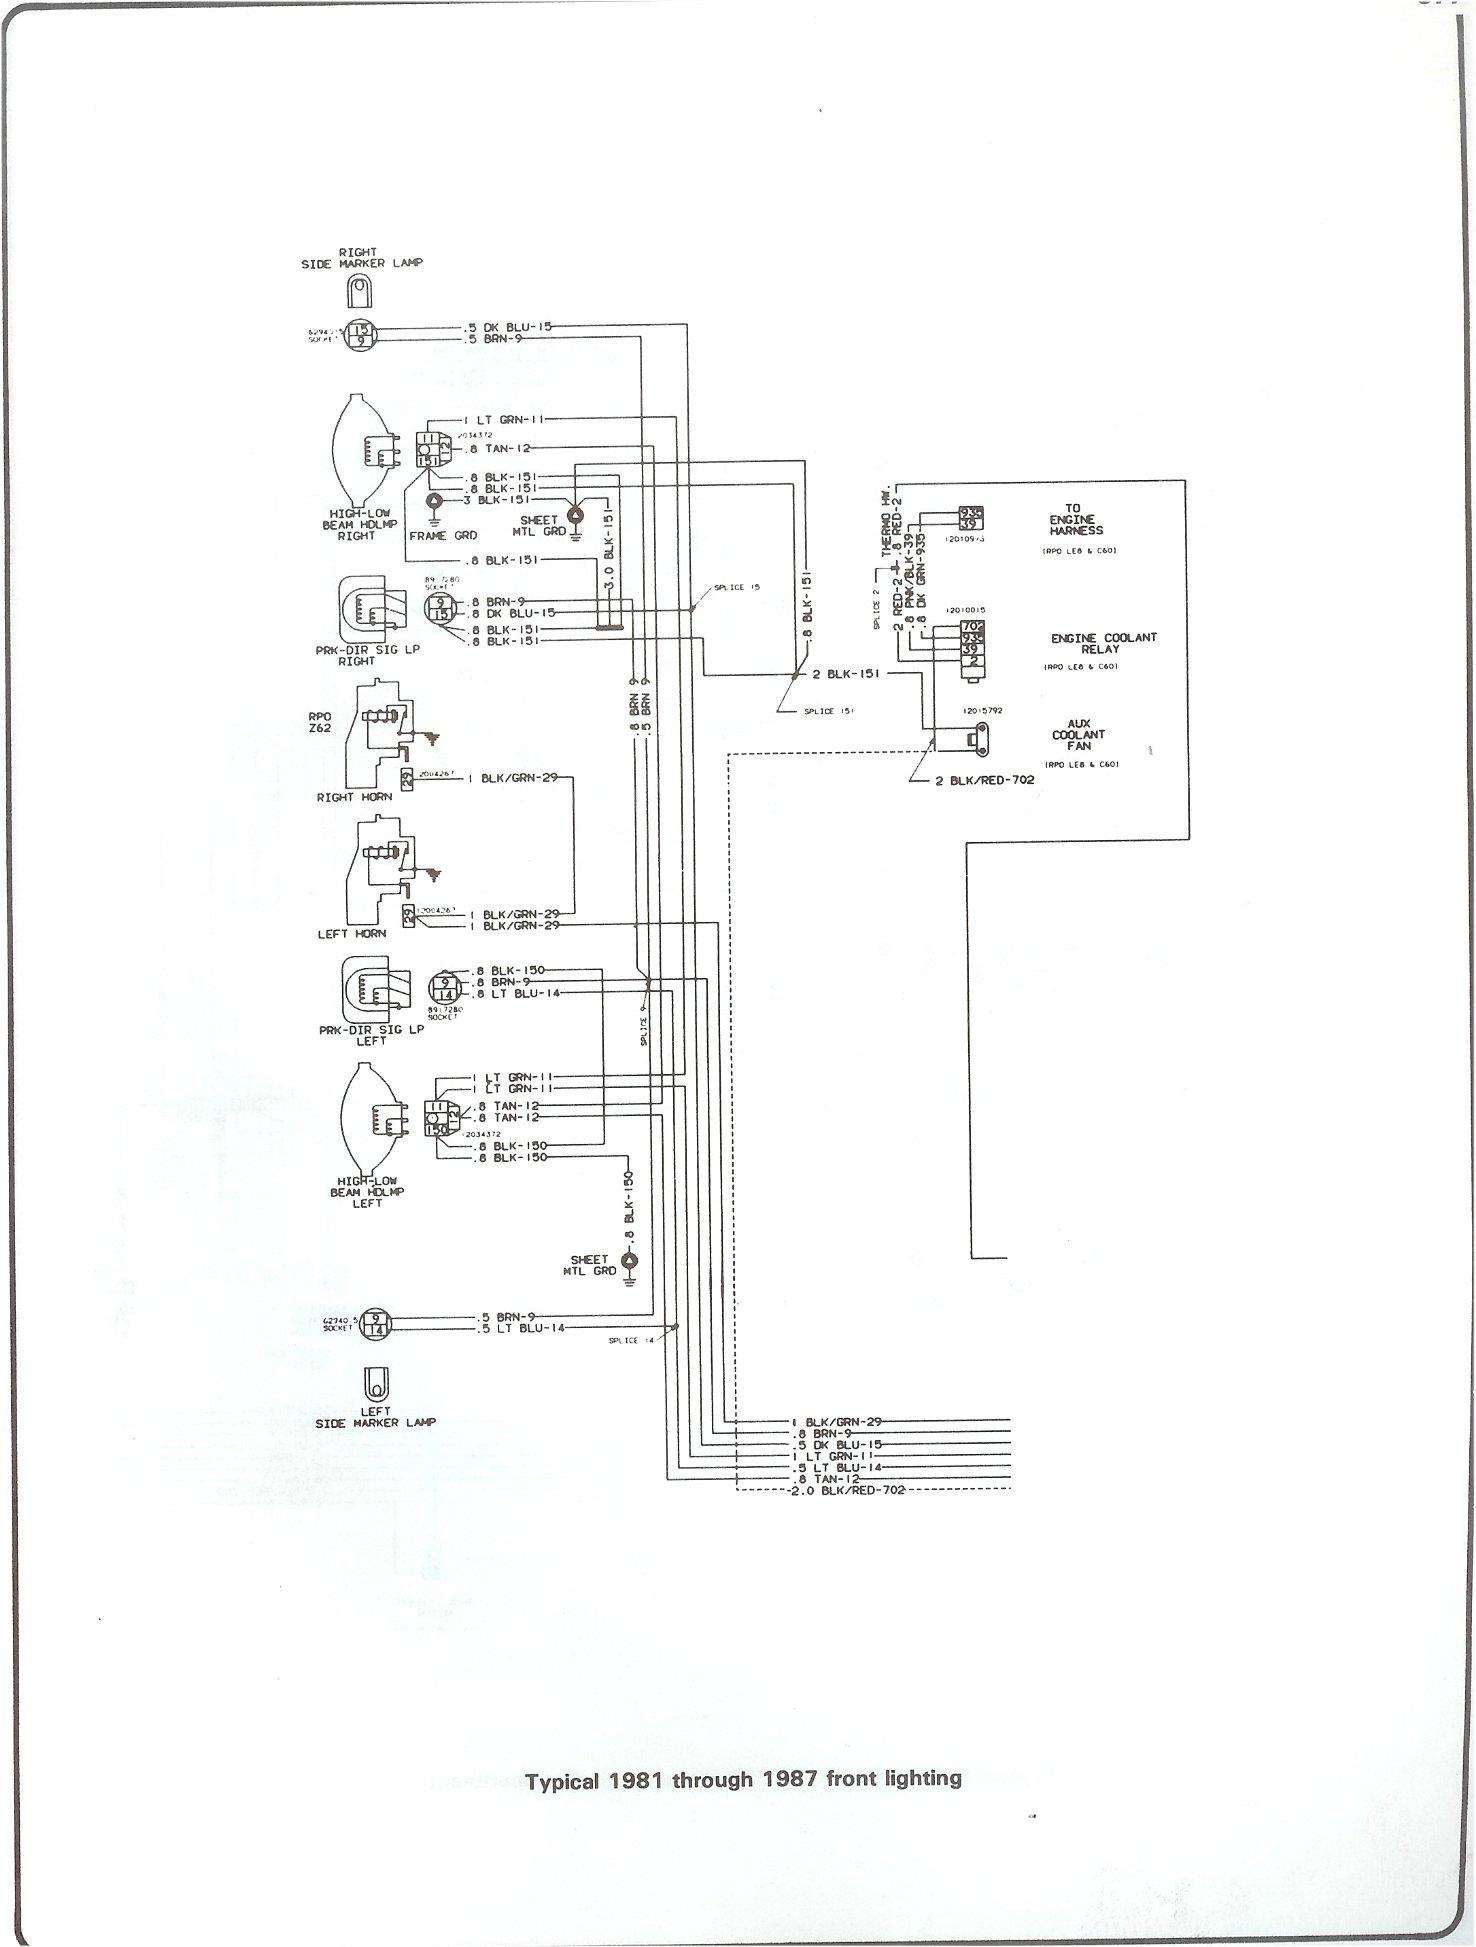 Tremendous 1980 Gmc Wiring Wiring Diagram Wiring Cloud Hisonepsysticxongrecoveryedborg